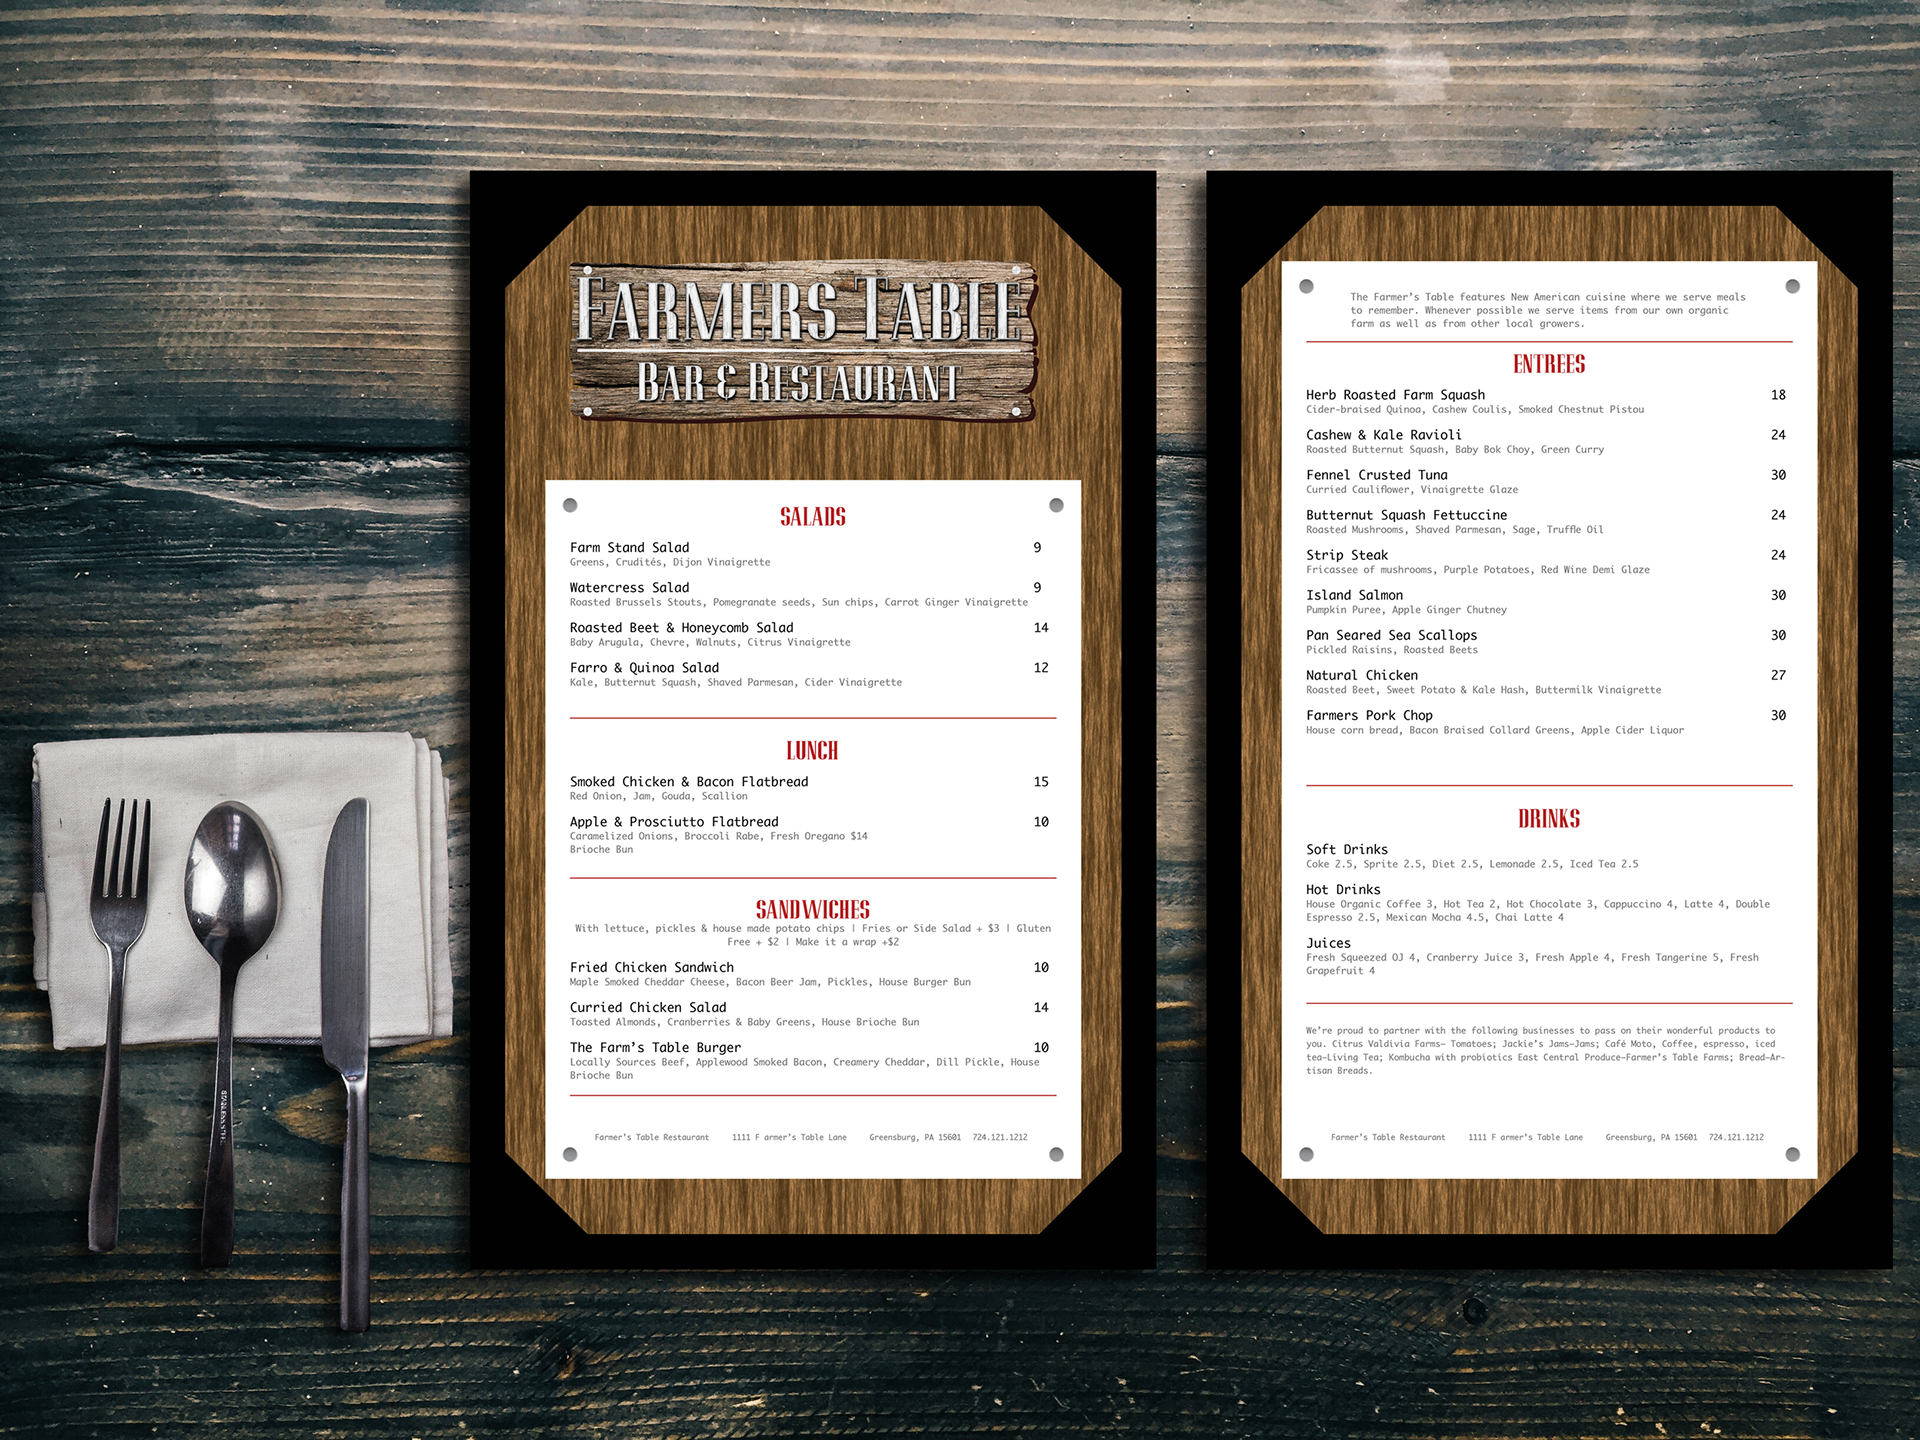 John Kenneally Farmers Table - Farmers table menu